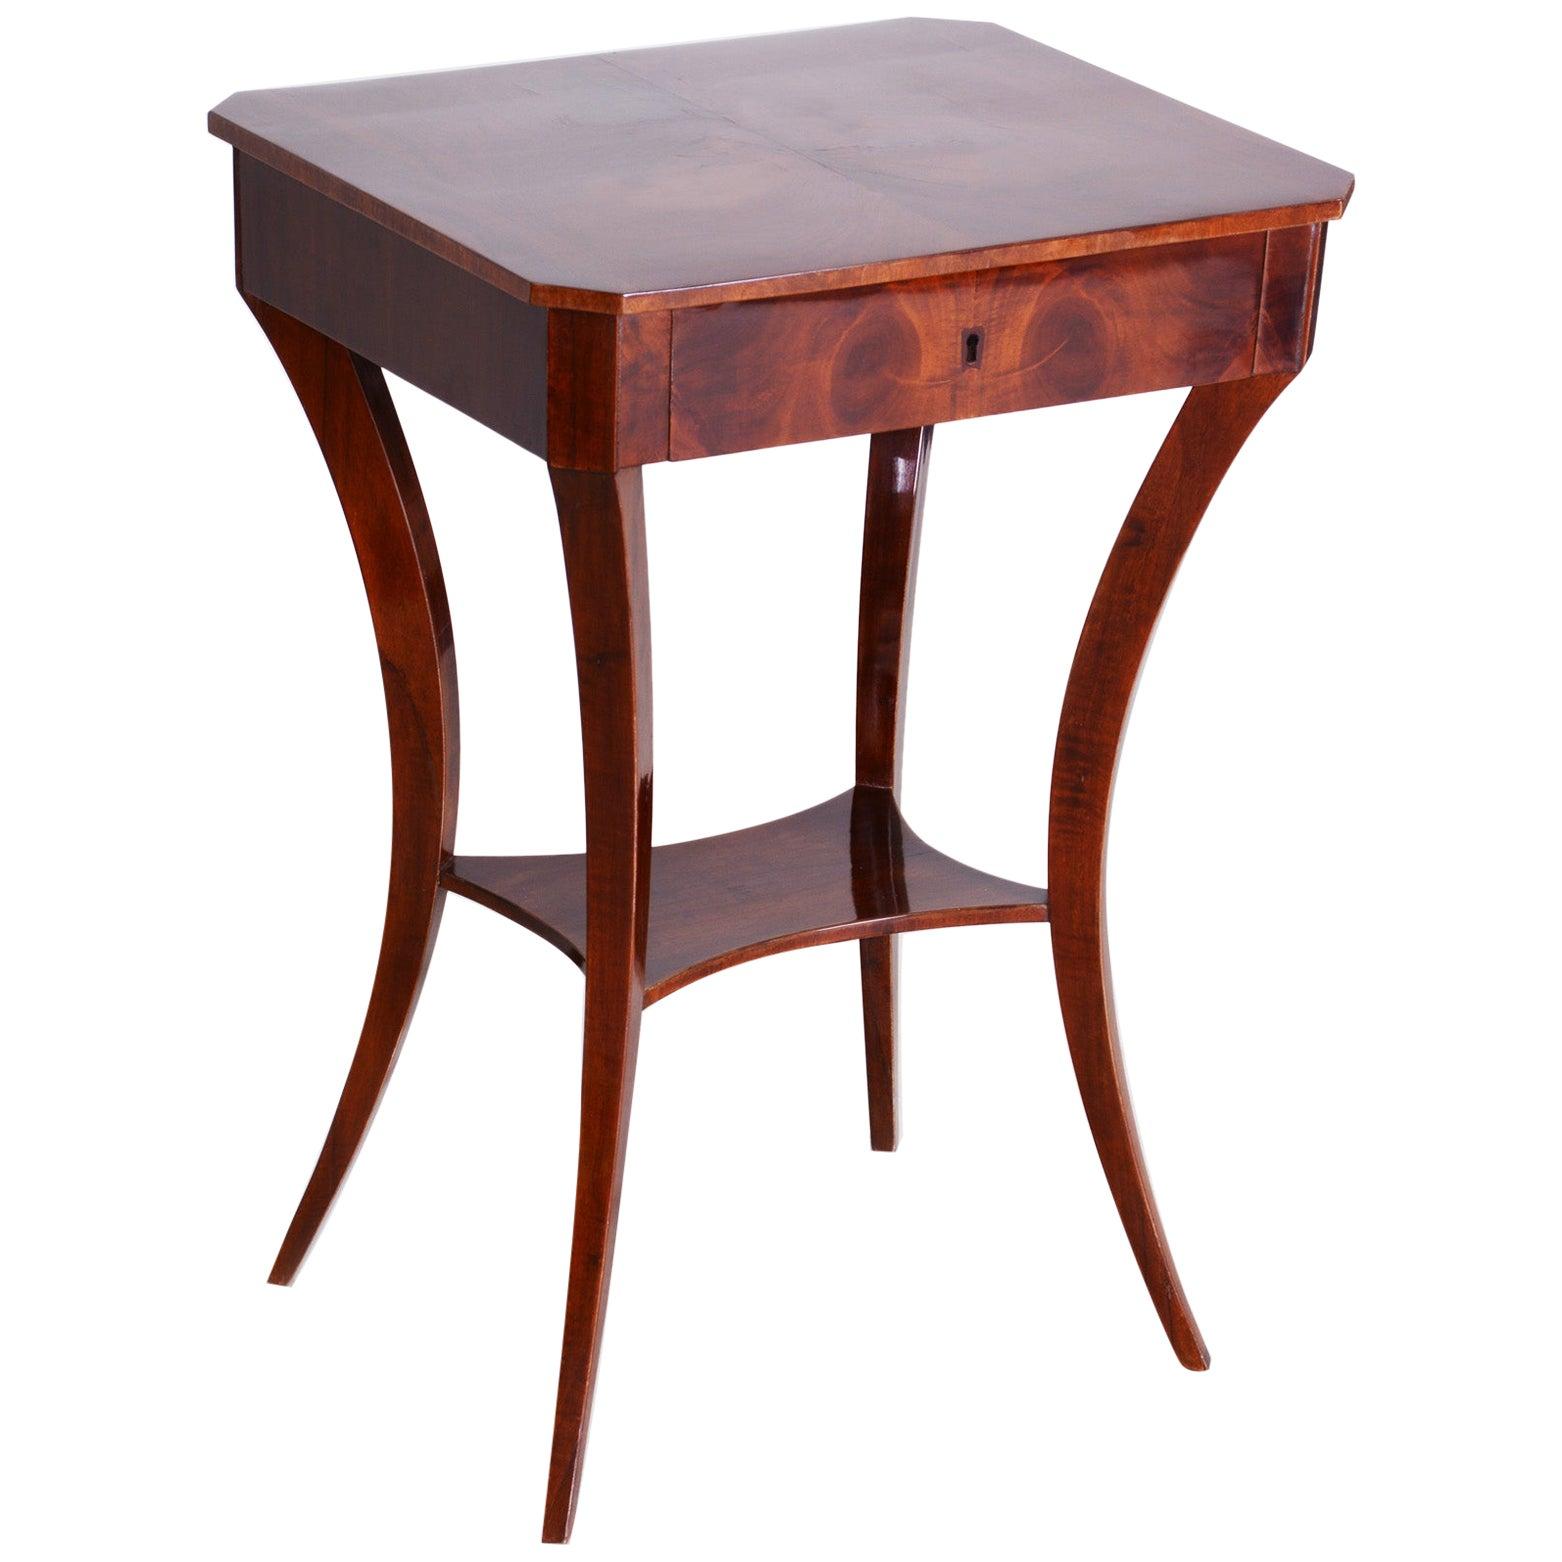 Small Brown Walnut Biedermeier Table, Germany, 1830s, Shellac Polished